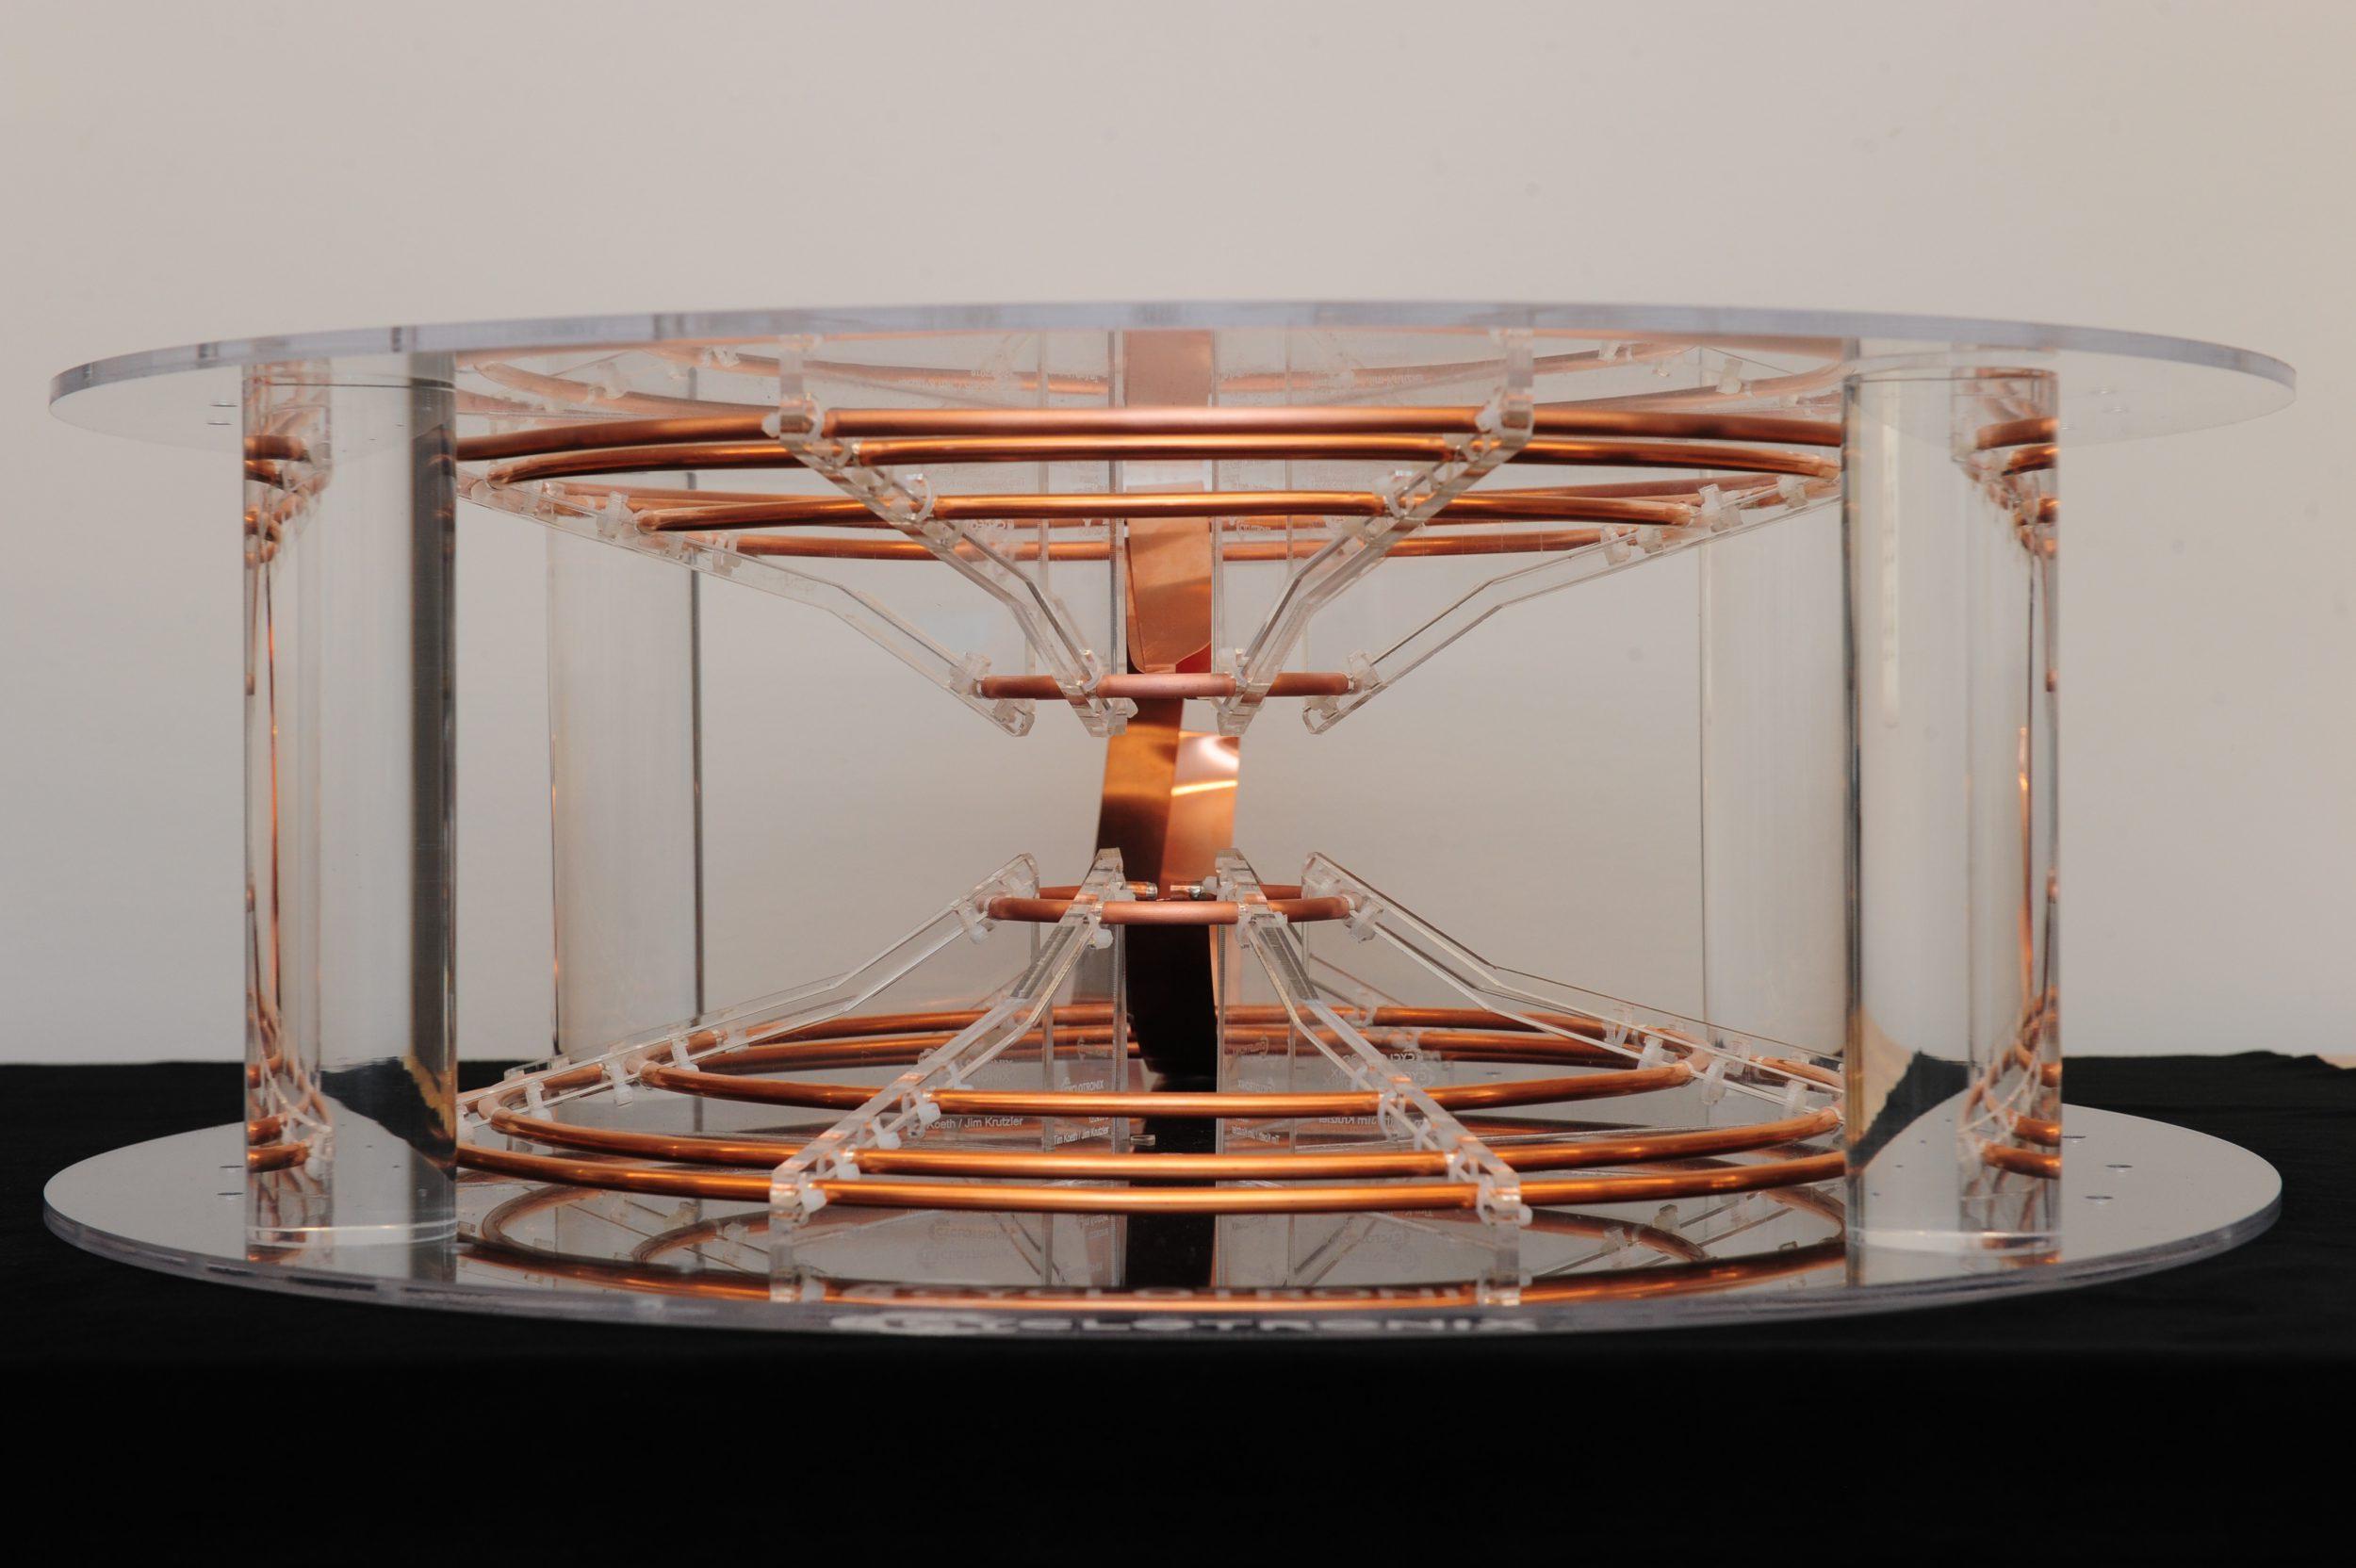 Plasma Betatron Coil Form: Design and Construction